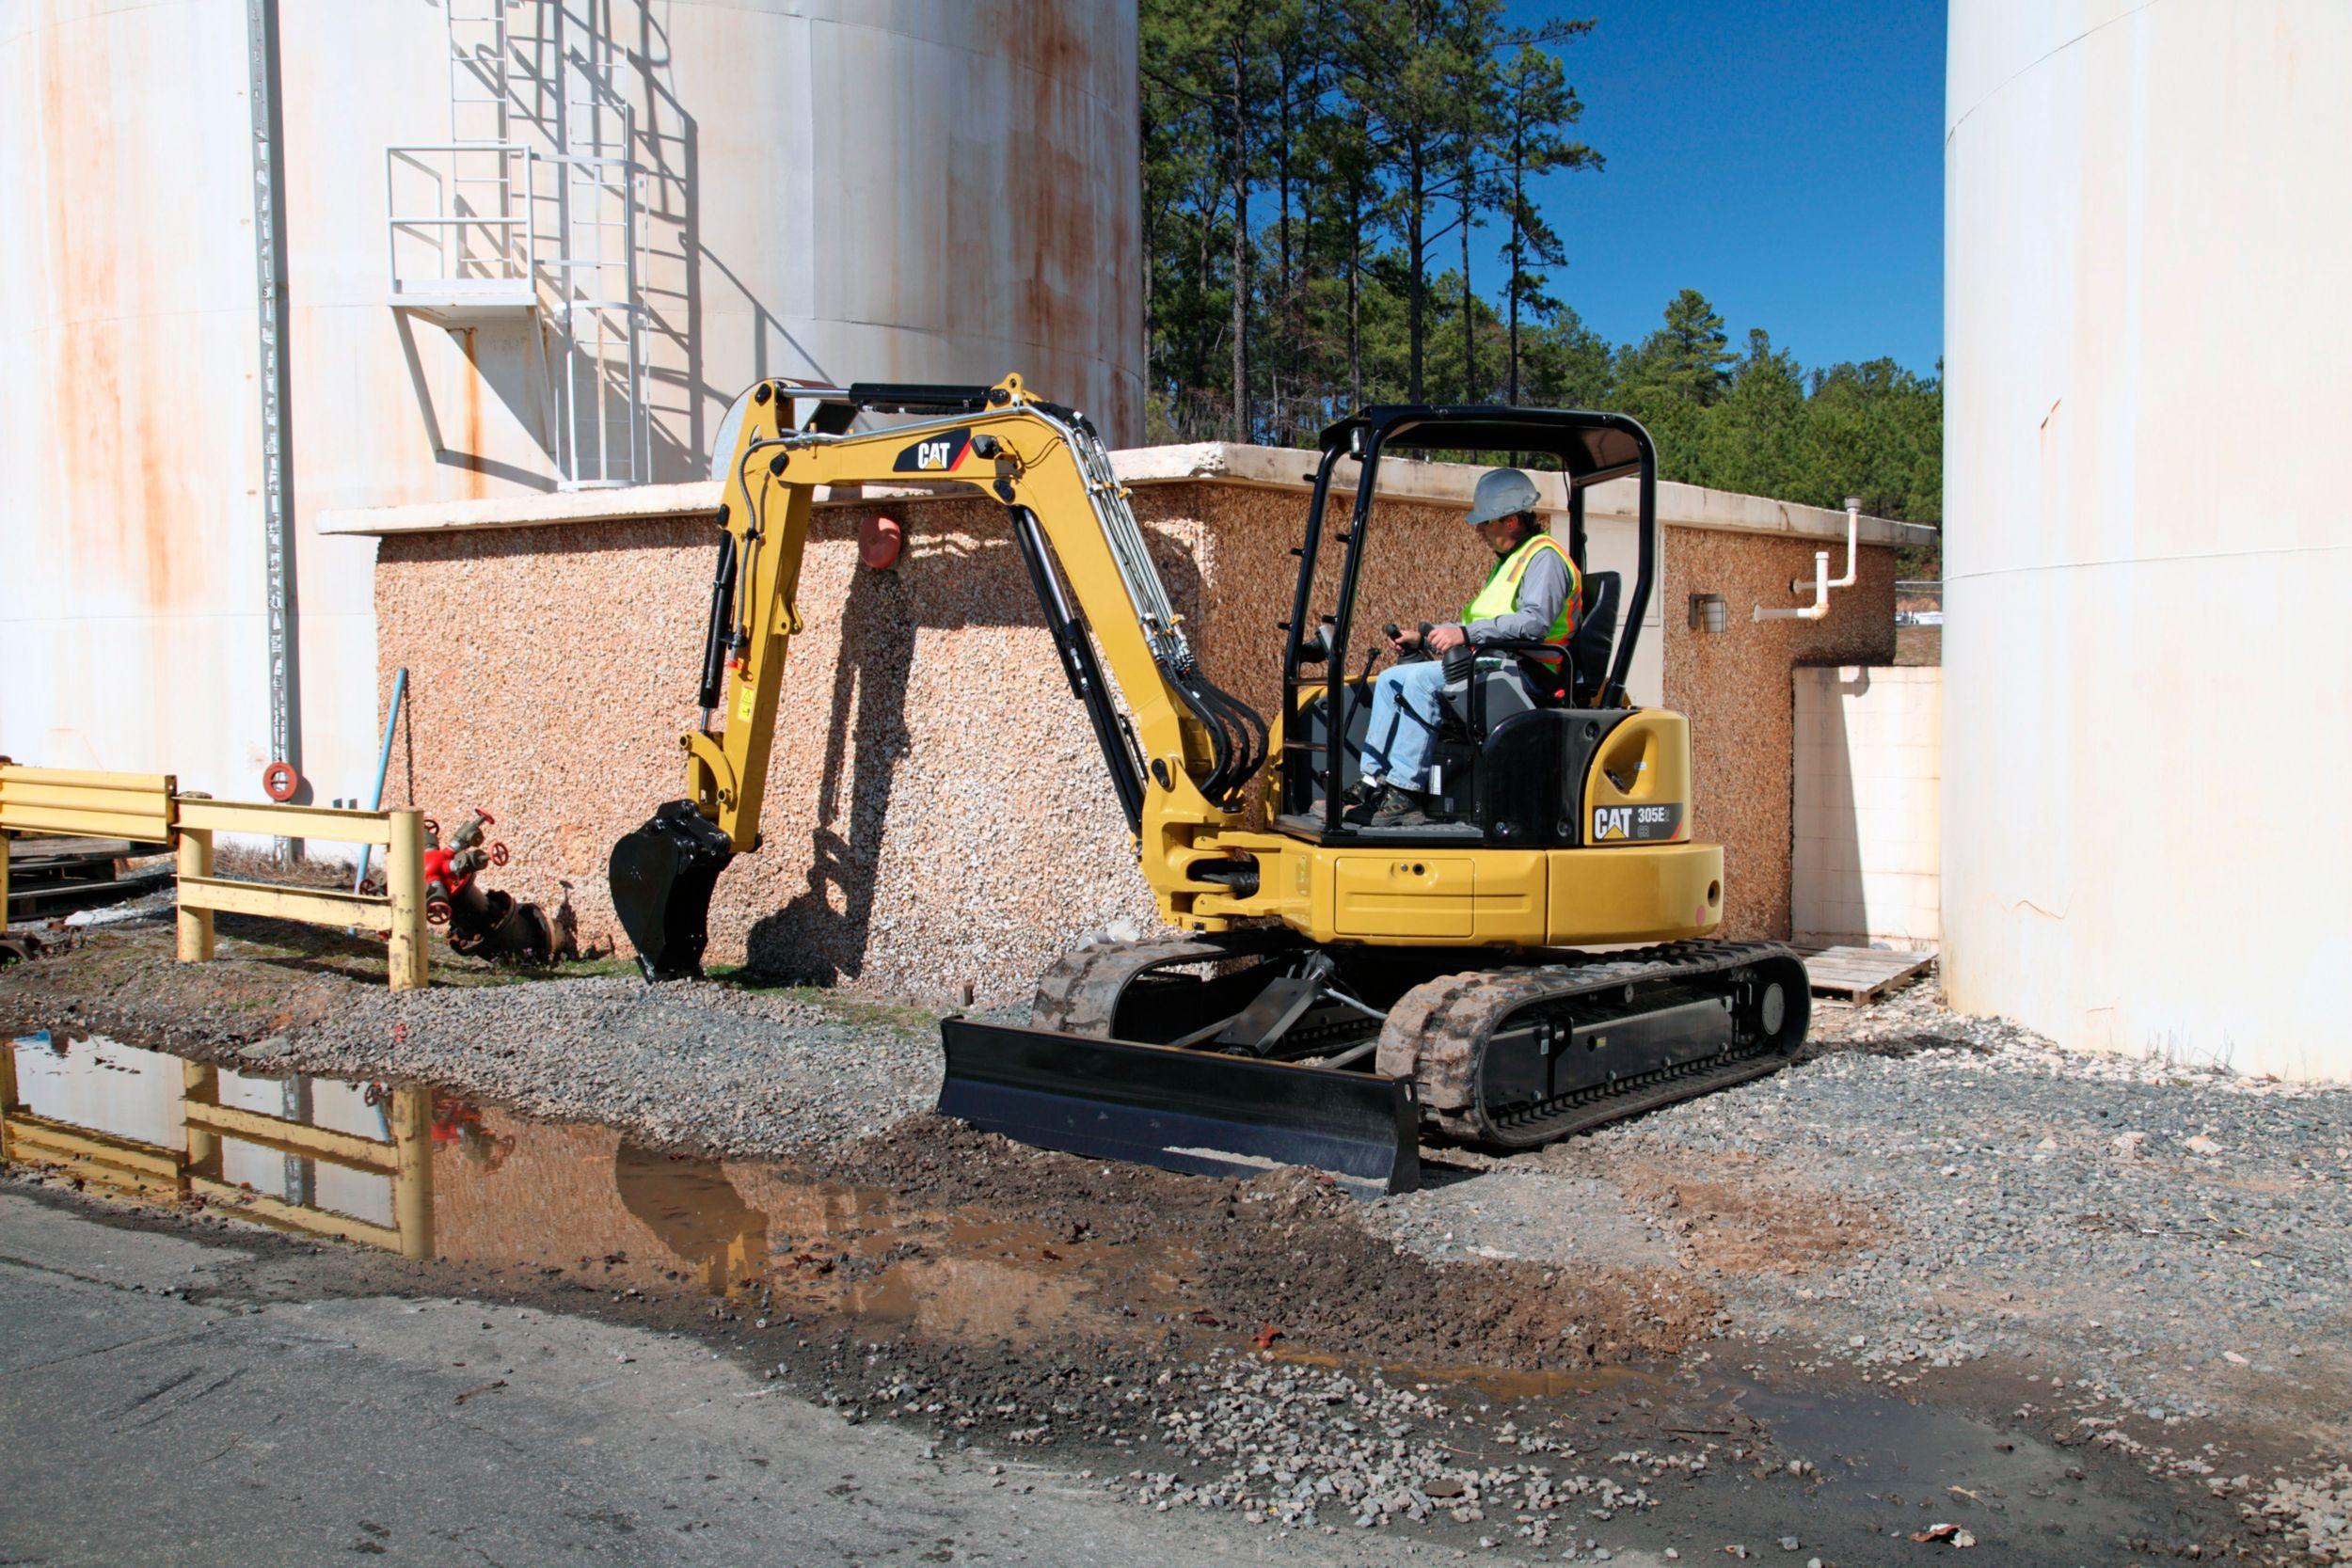 305E2 CR Mini Excavator